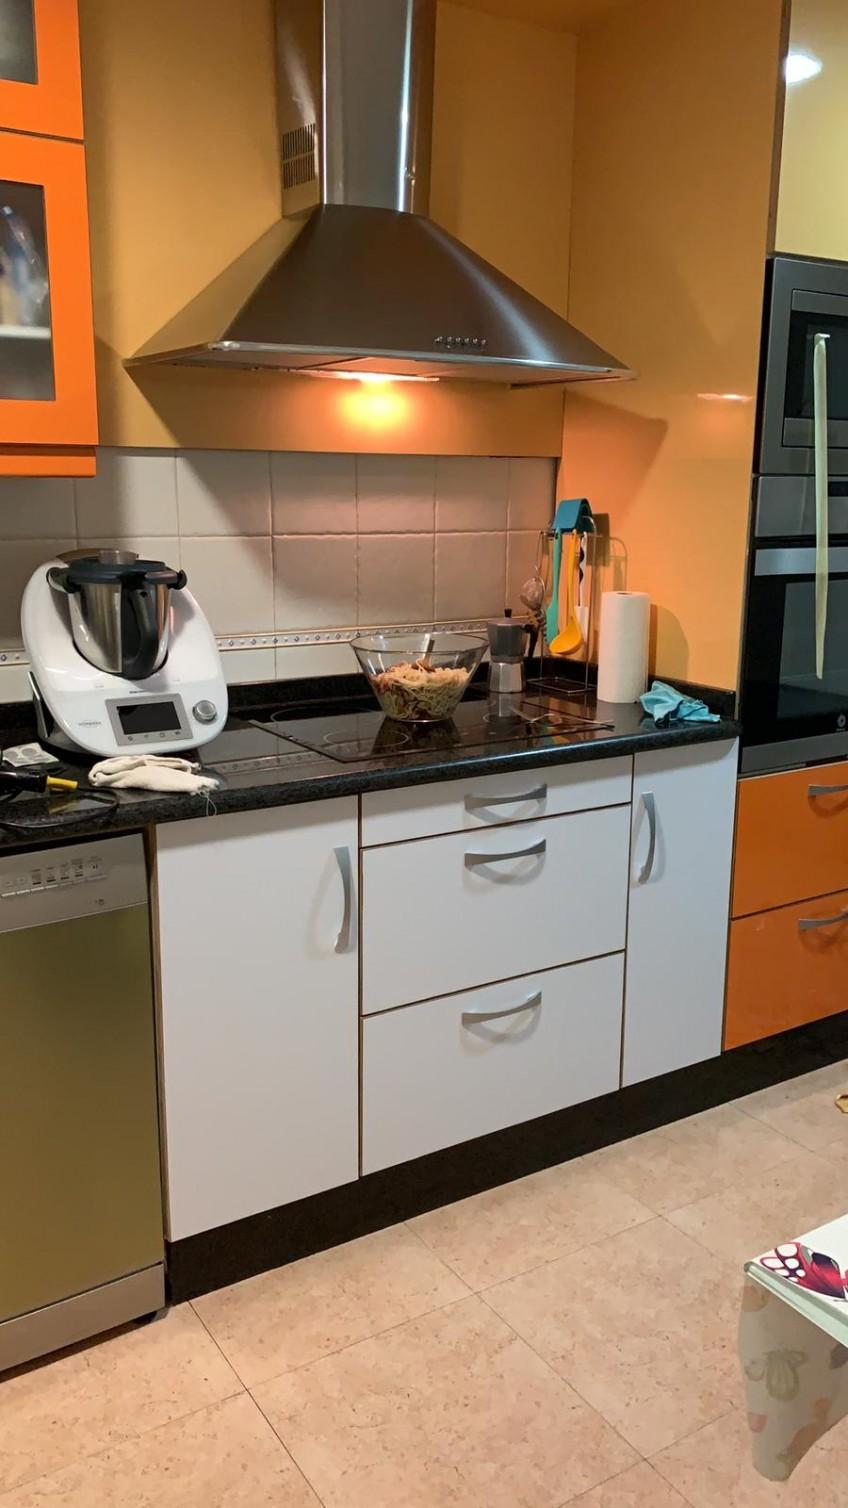 Vinilo-blanco-lavable-para-tapar-color-naranja-de-muebles-de-cocina-lokoloko